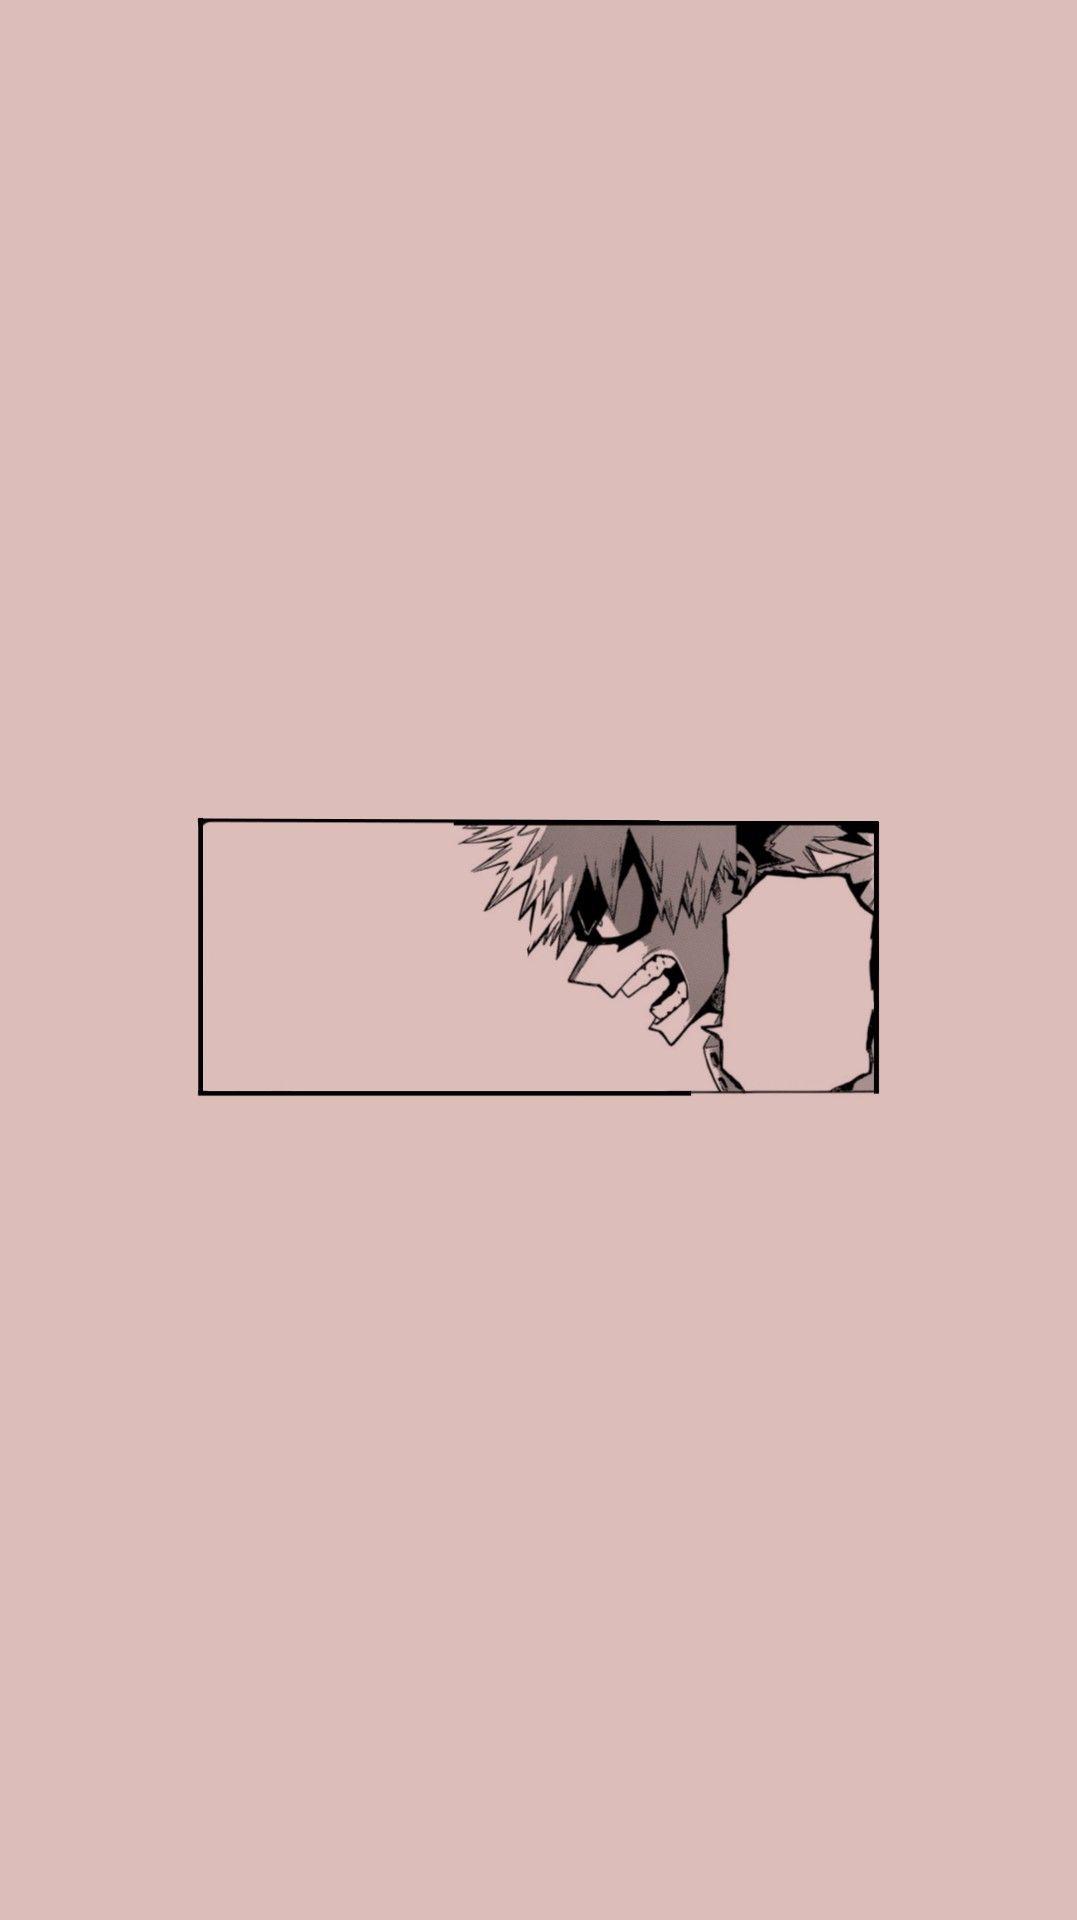 Uwu My Hero Academia Lockscreens In 2021 Anime Wallpaper Cute Anime Wallpaper Anime Background